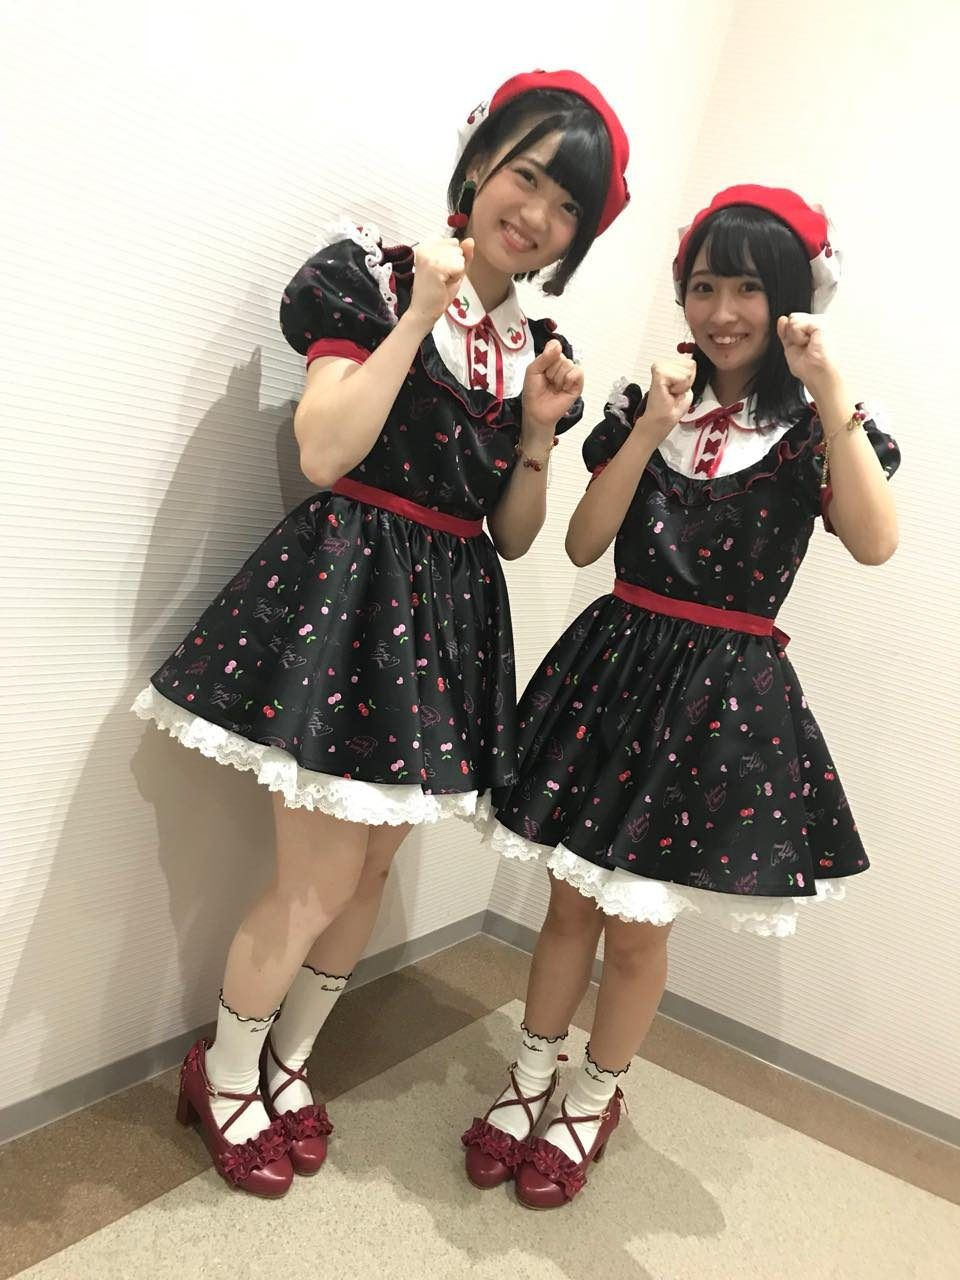 AKB48グループ第2回ユニットじゃんけん大会、優勝は多田京加&松田祐実 Fortune cherry!12/19メジャーデビュー決定!